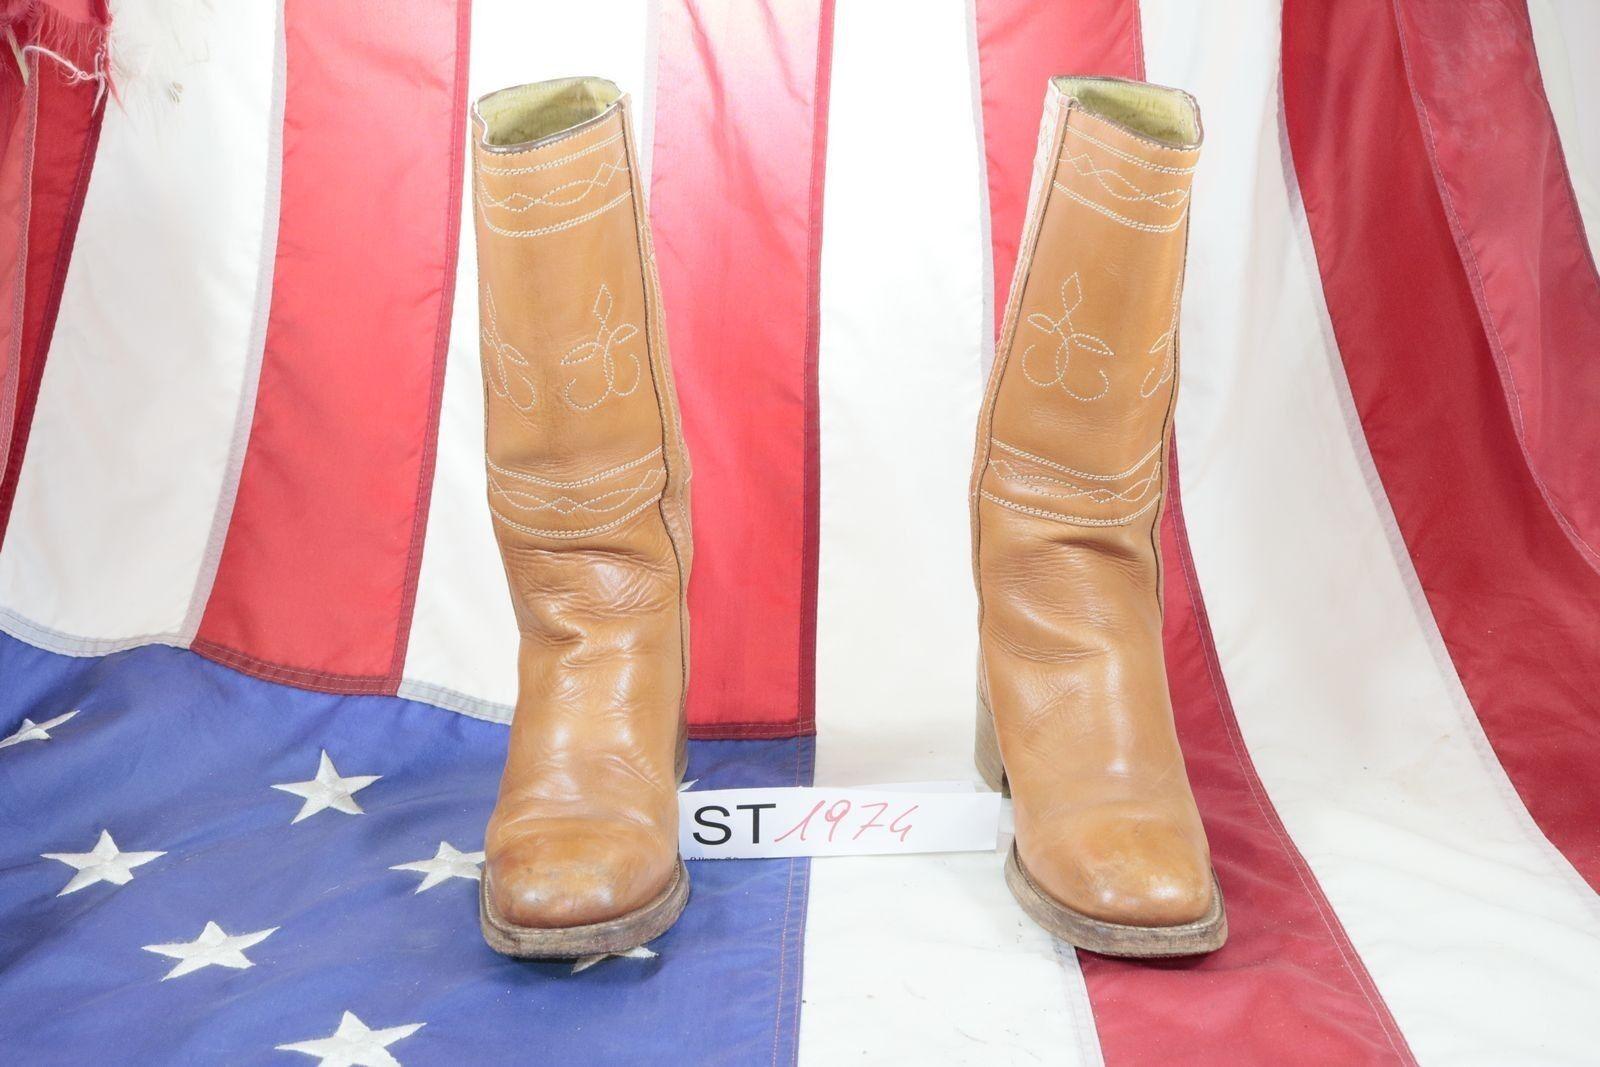 Boots CONLEY'S ( Cod. St1974) Used N.37 Ladies Brown Leather Cowboy Western